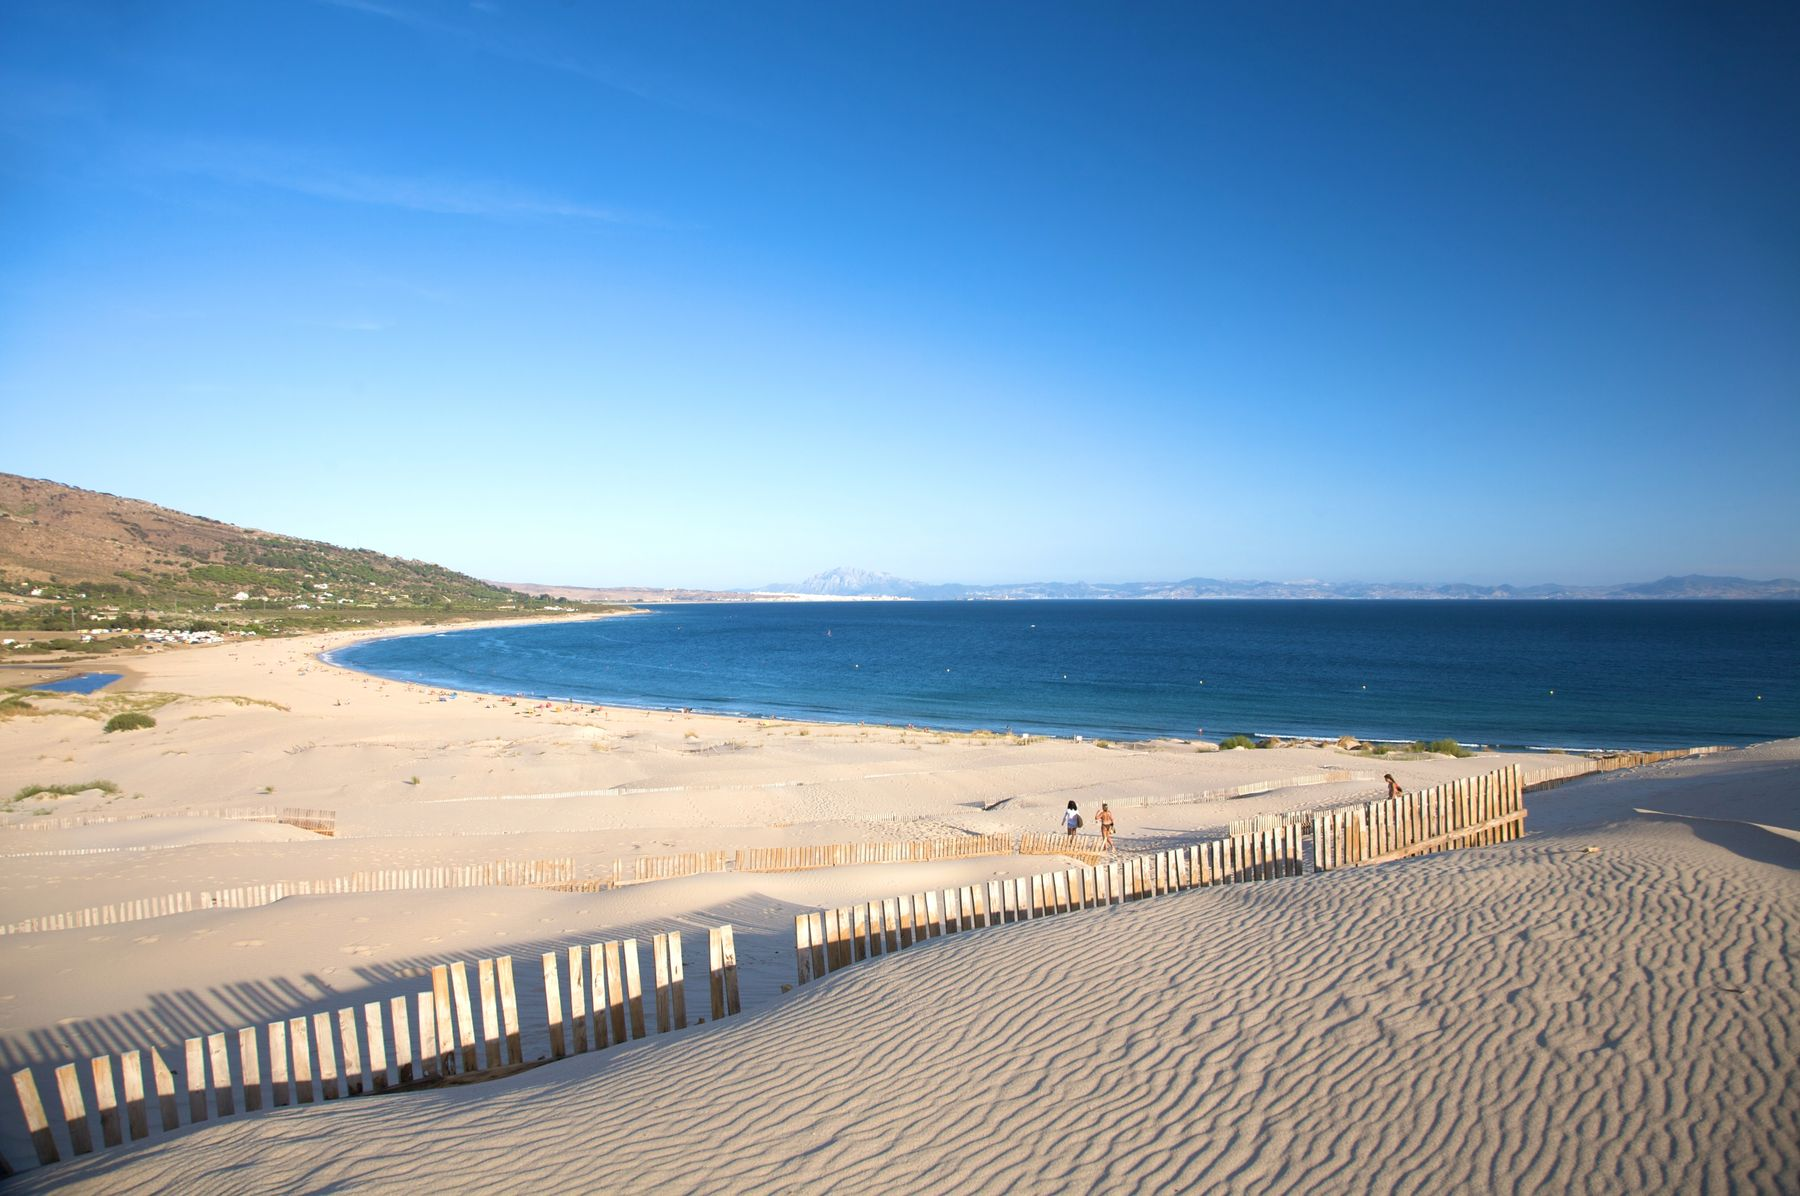 Playa de Valdevaqueros, Cádiz